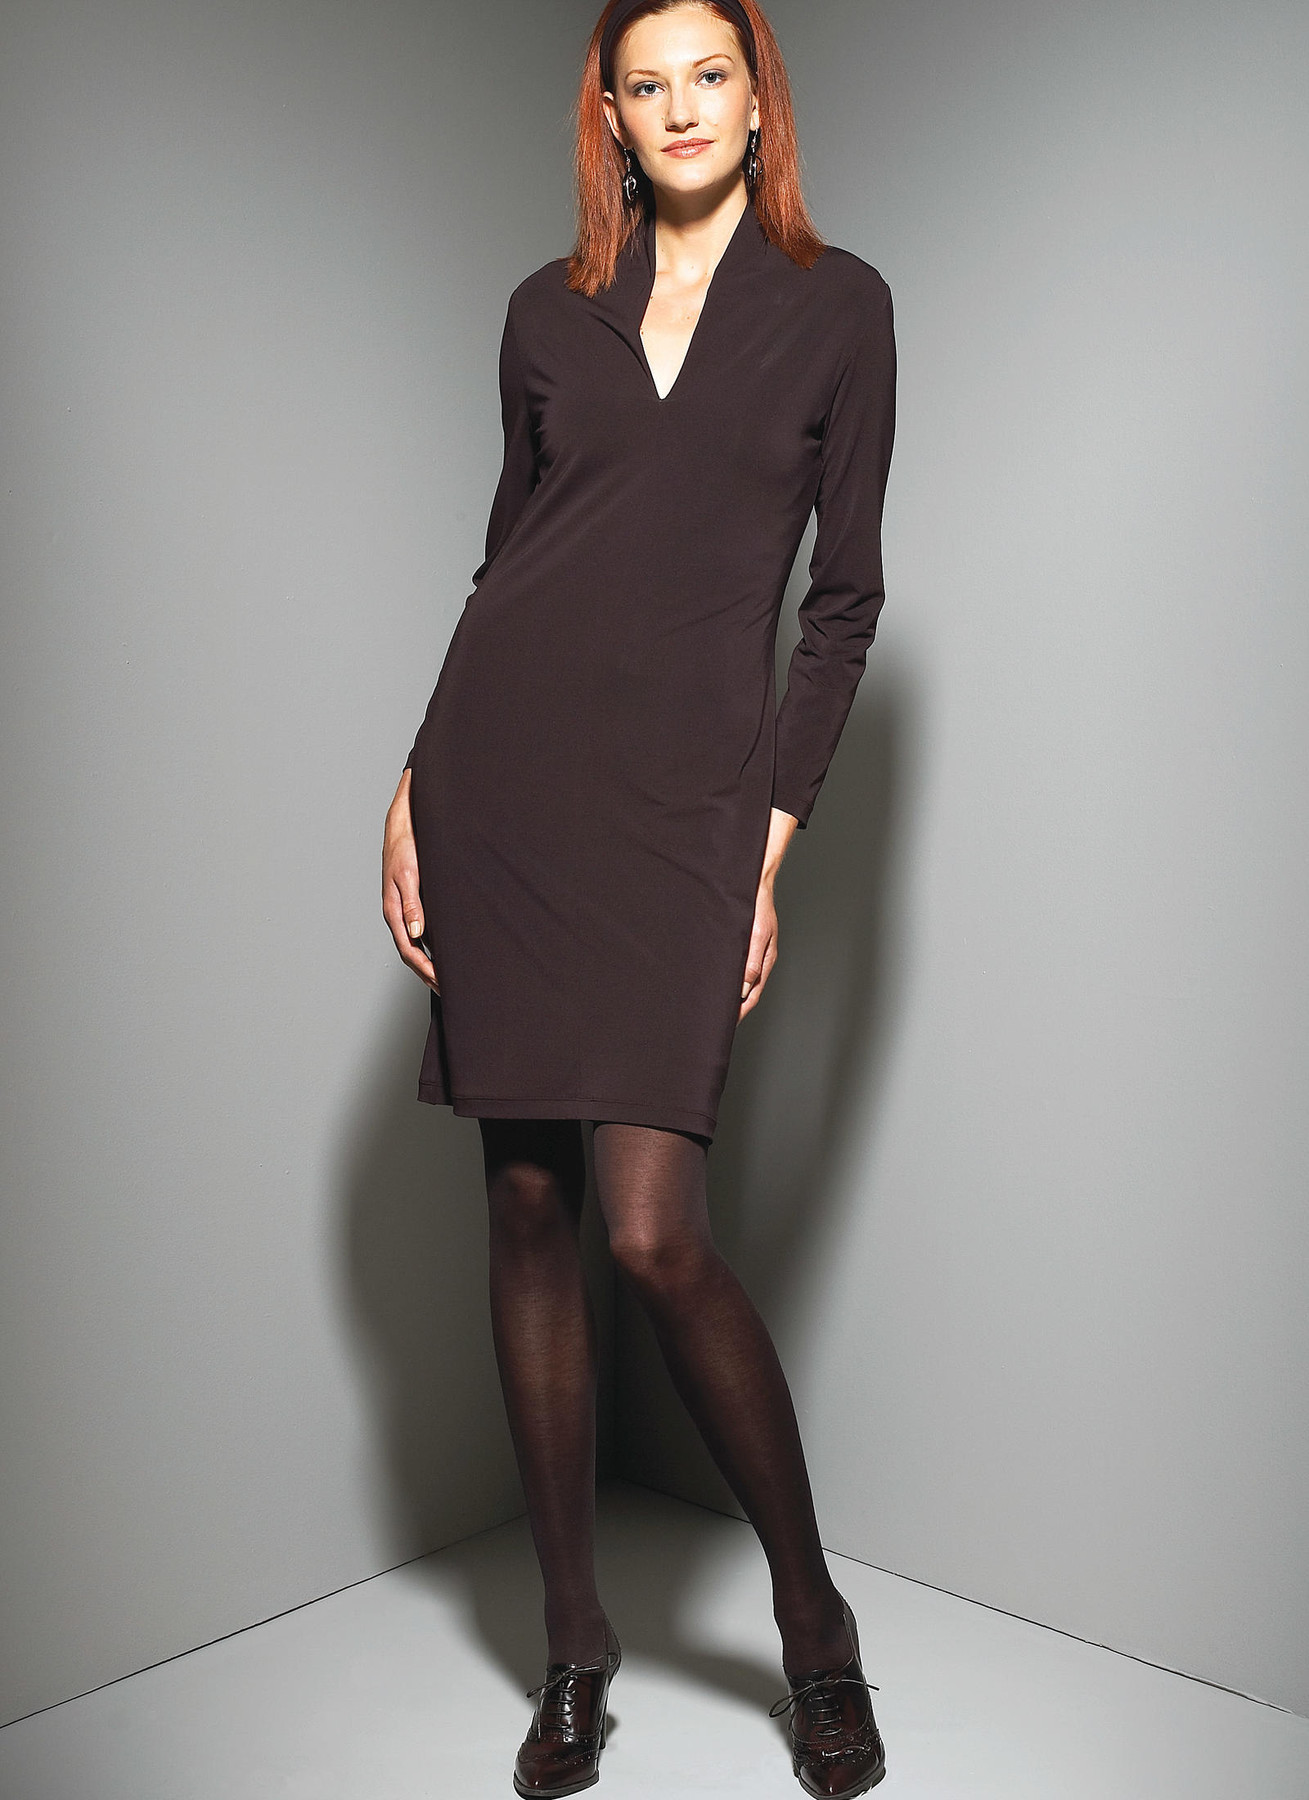 KwikSew-3658 Kwik Sew Ladies Sewing Pattern 3658 V neck Top /& Dress